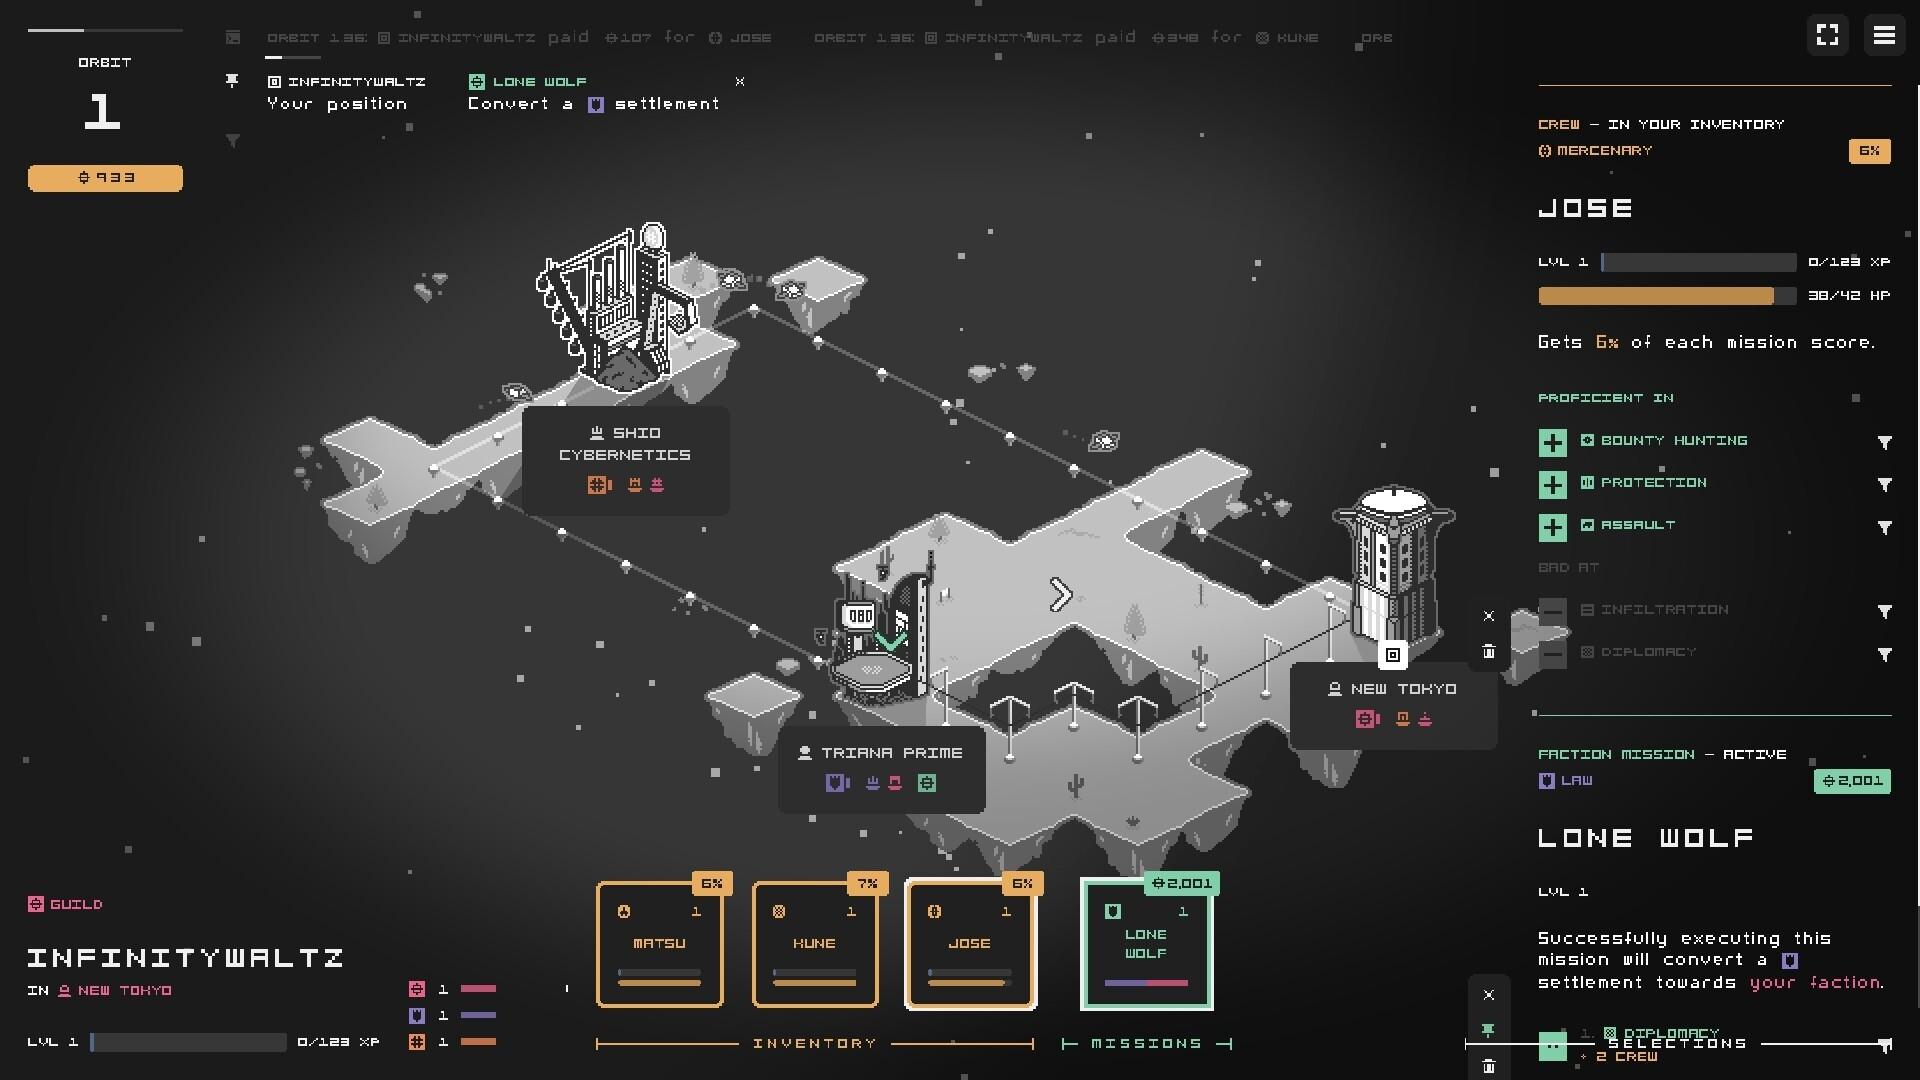 Sublunar game screenshot 2